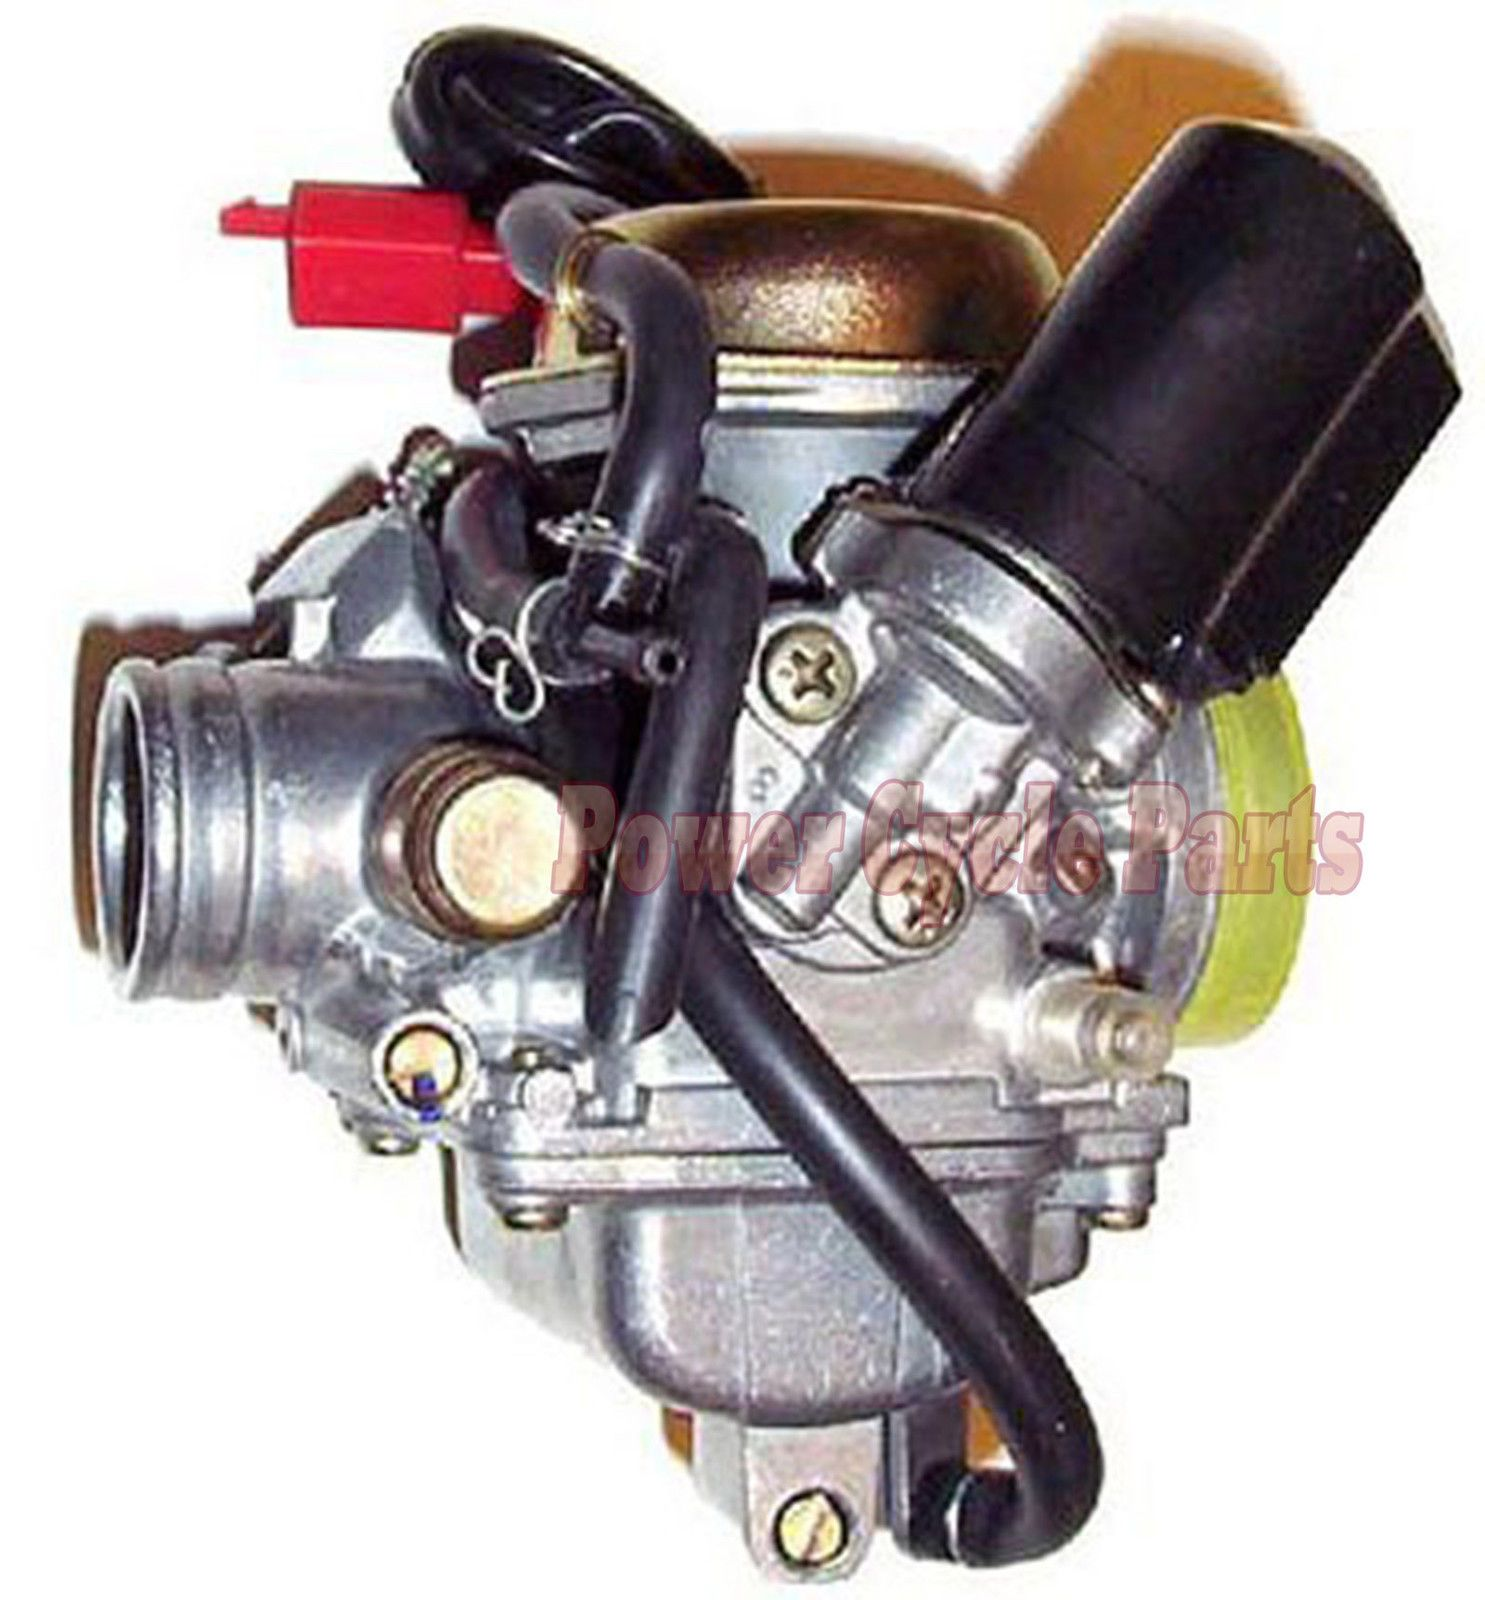 Gy6 150cc Complete Carburetor Roketa Lance Tank Bmx Znen Sunl Pd24j Carb Choke 150cc Carburetor Fuel Delivery